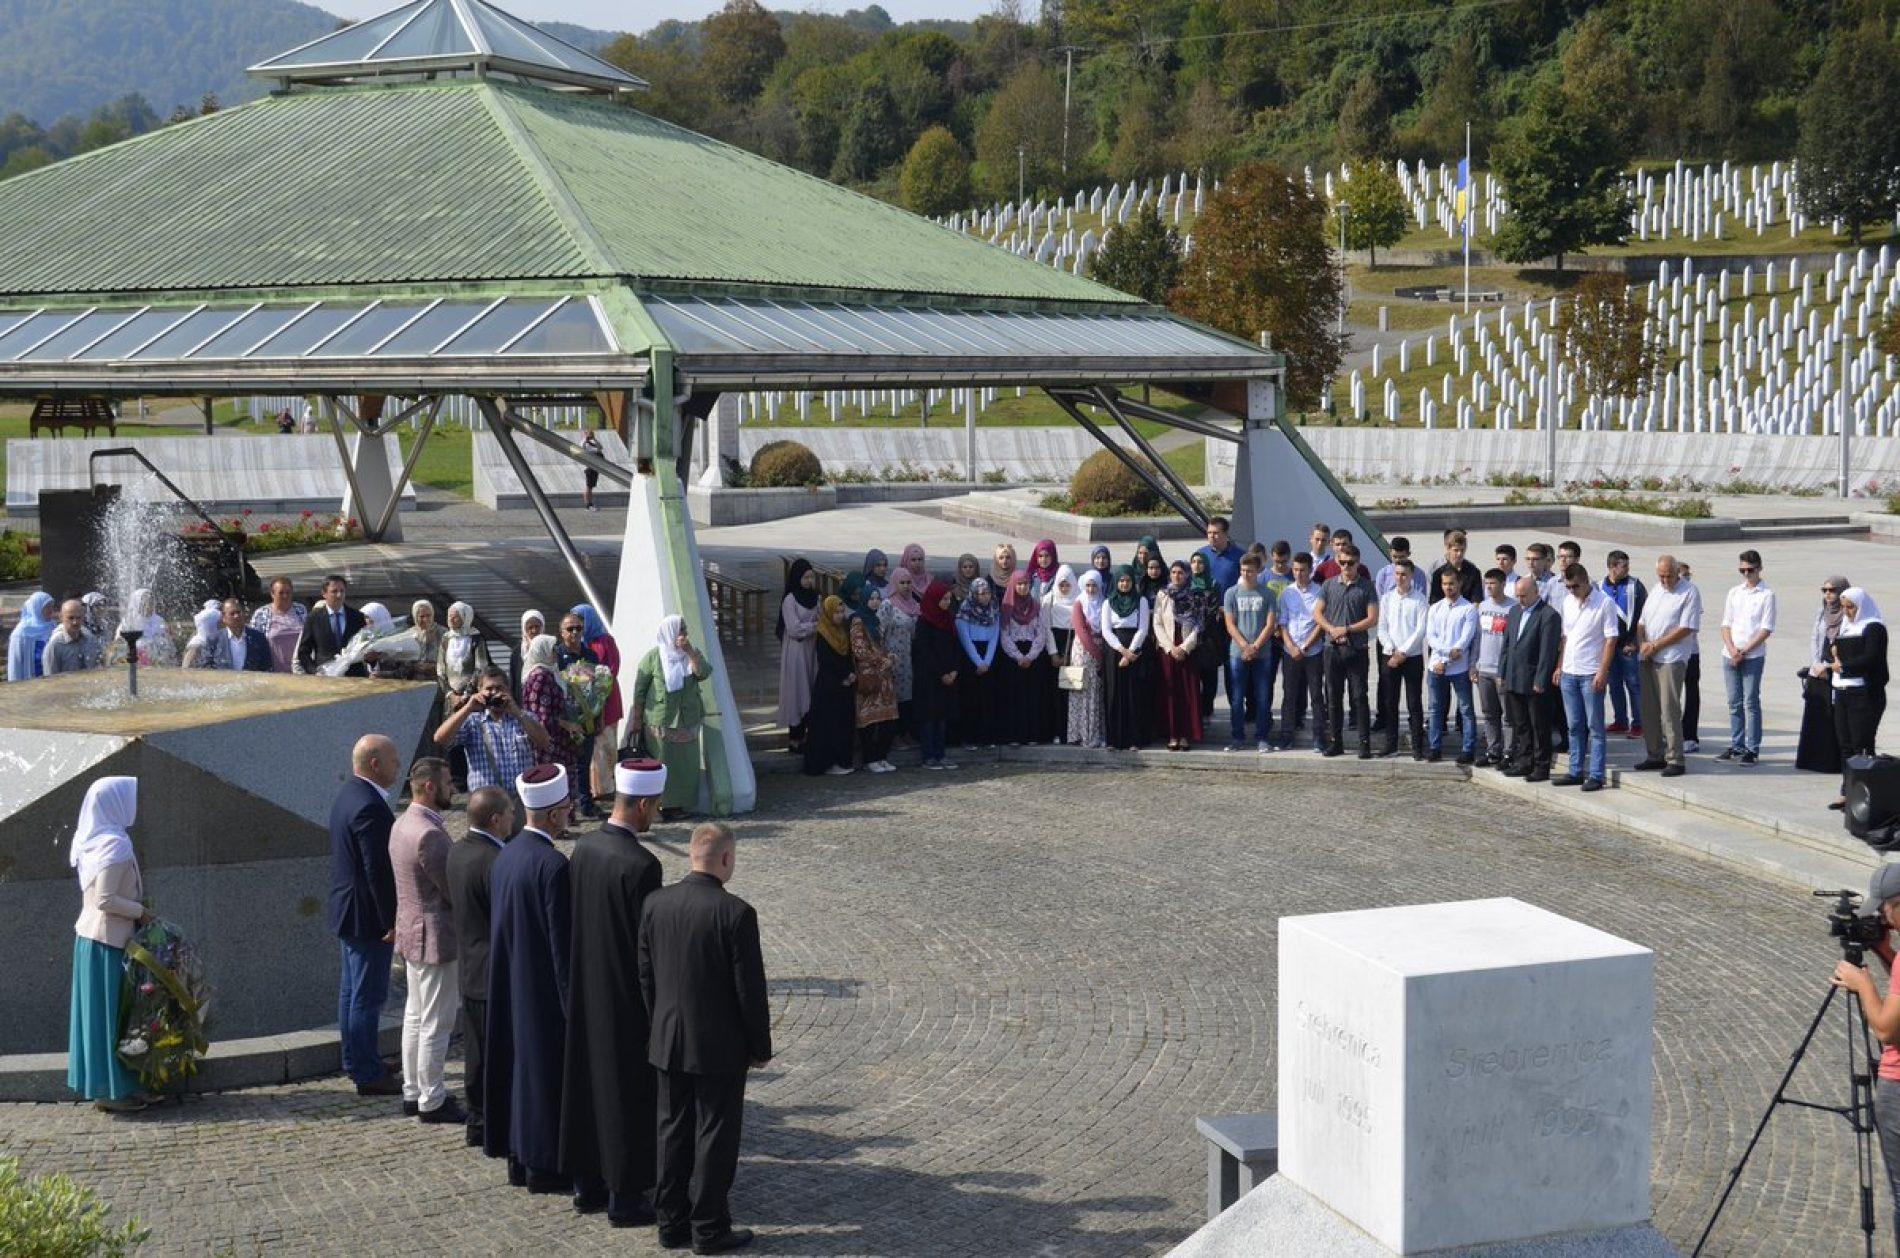 Obilježena 15. godišnjica otvaranja Memorijalnog centra Potočari – Srebrenica